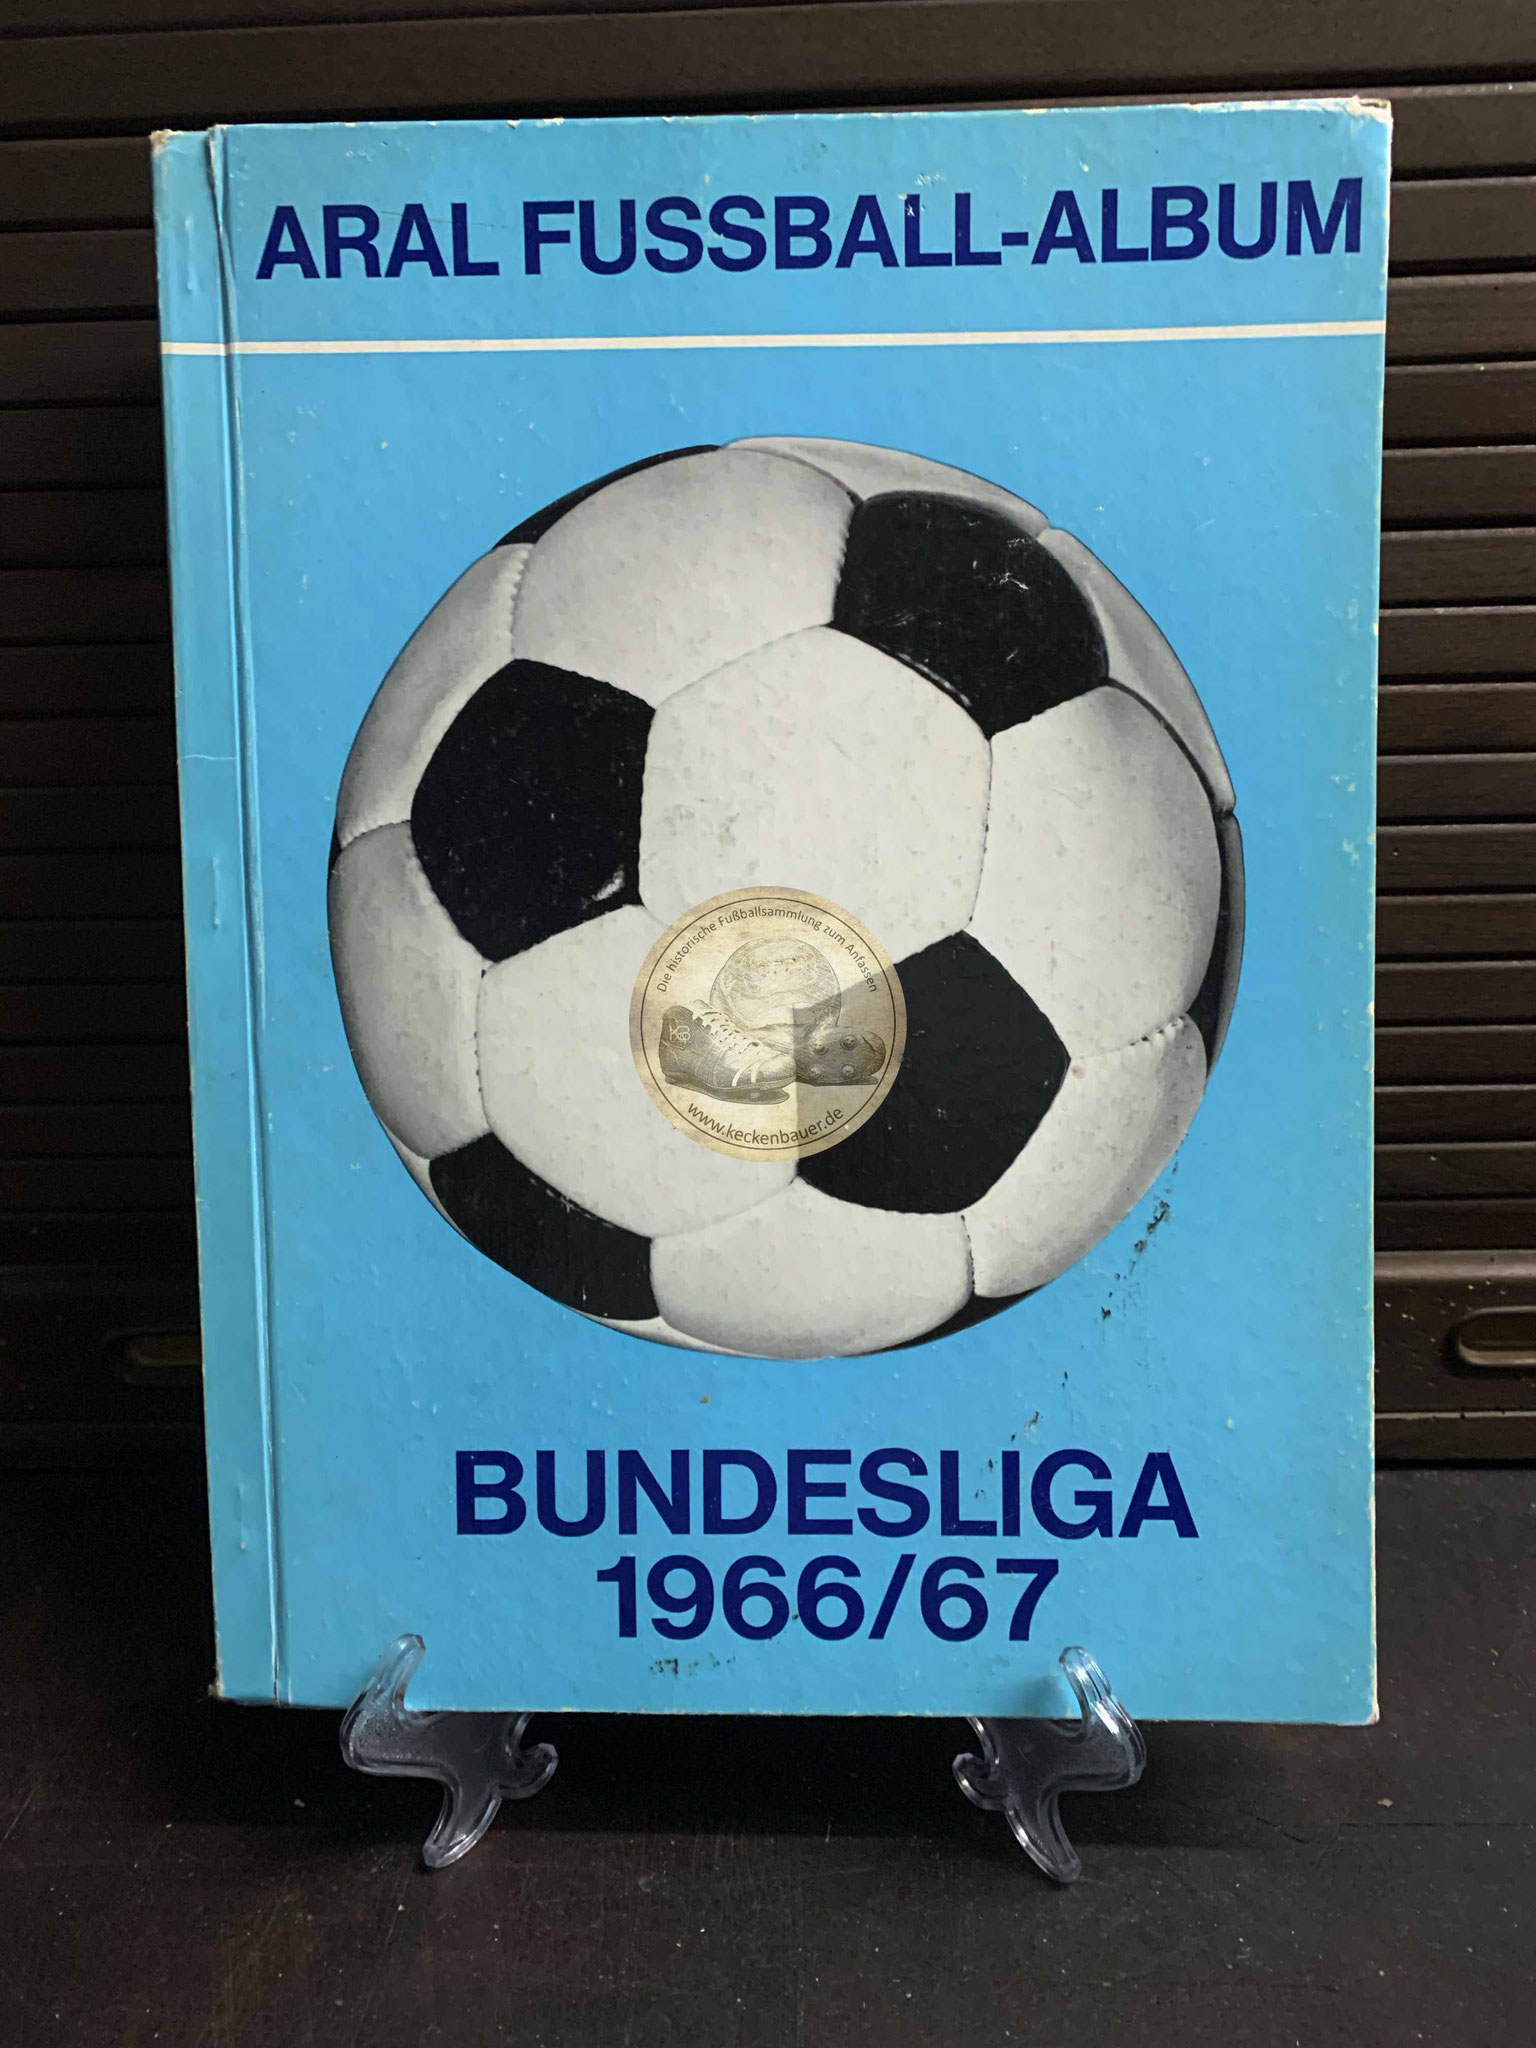 ARAL Fußball-Album Bundesliga 1966/67, natürlich vollständig.